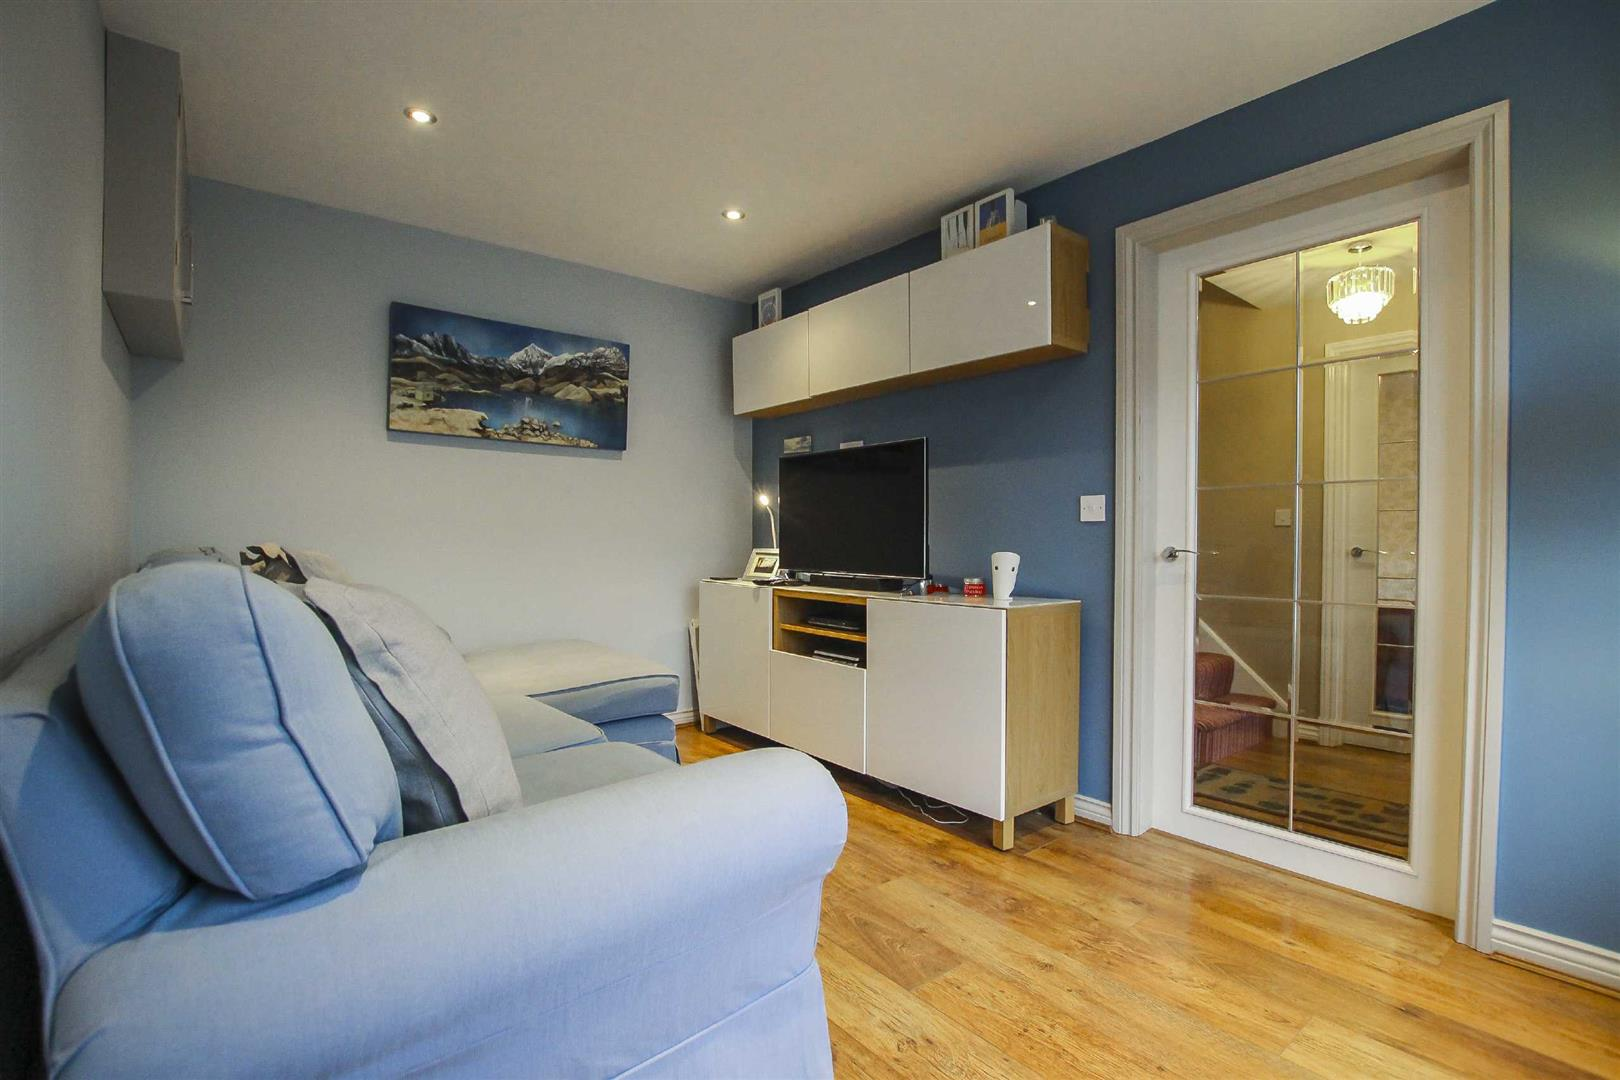 4 Bedroom Detached House For Sale - Image 11